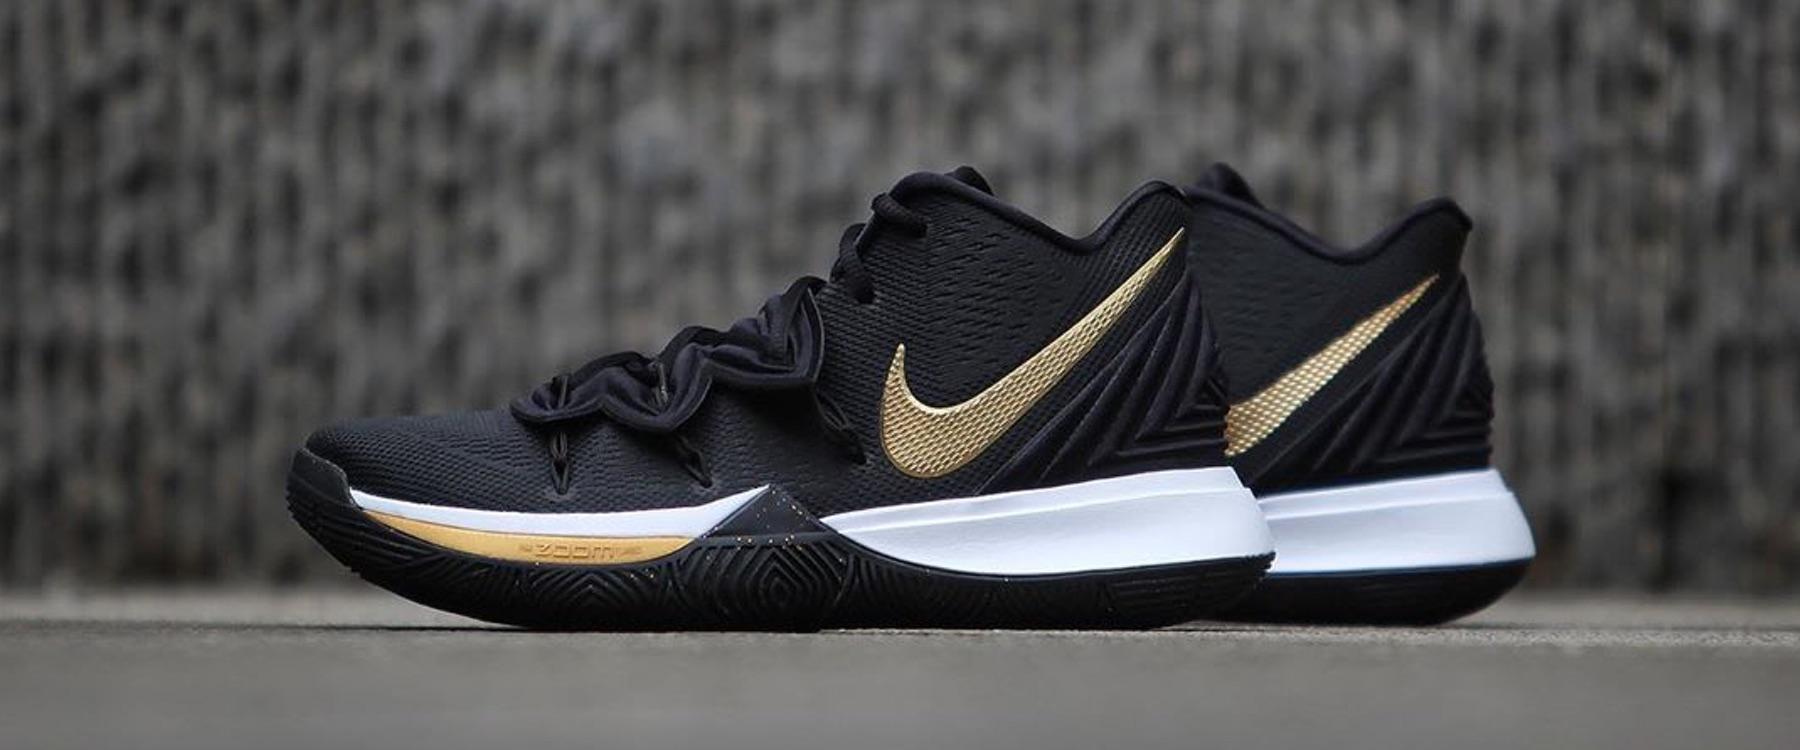 Nike Kyrie 5 Black/Metallic Gold – ITA